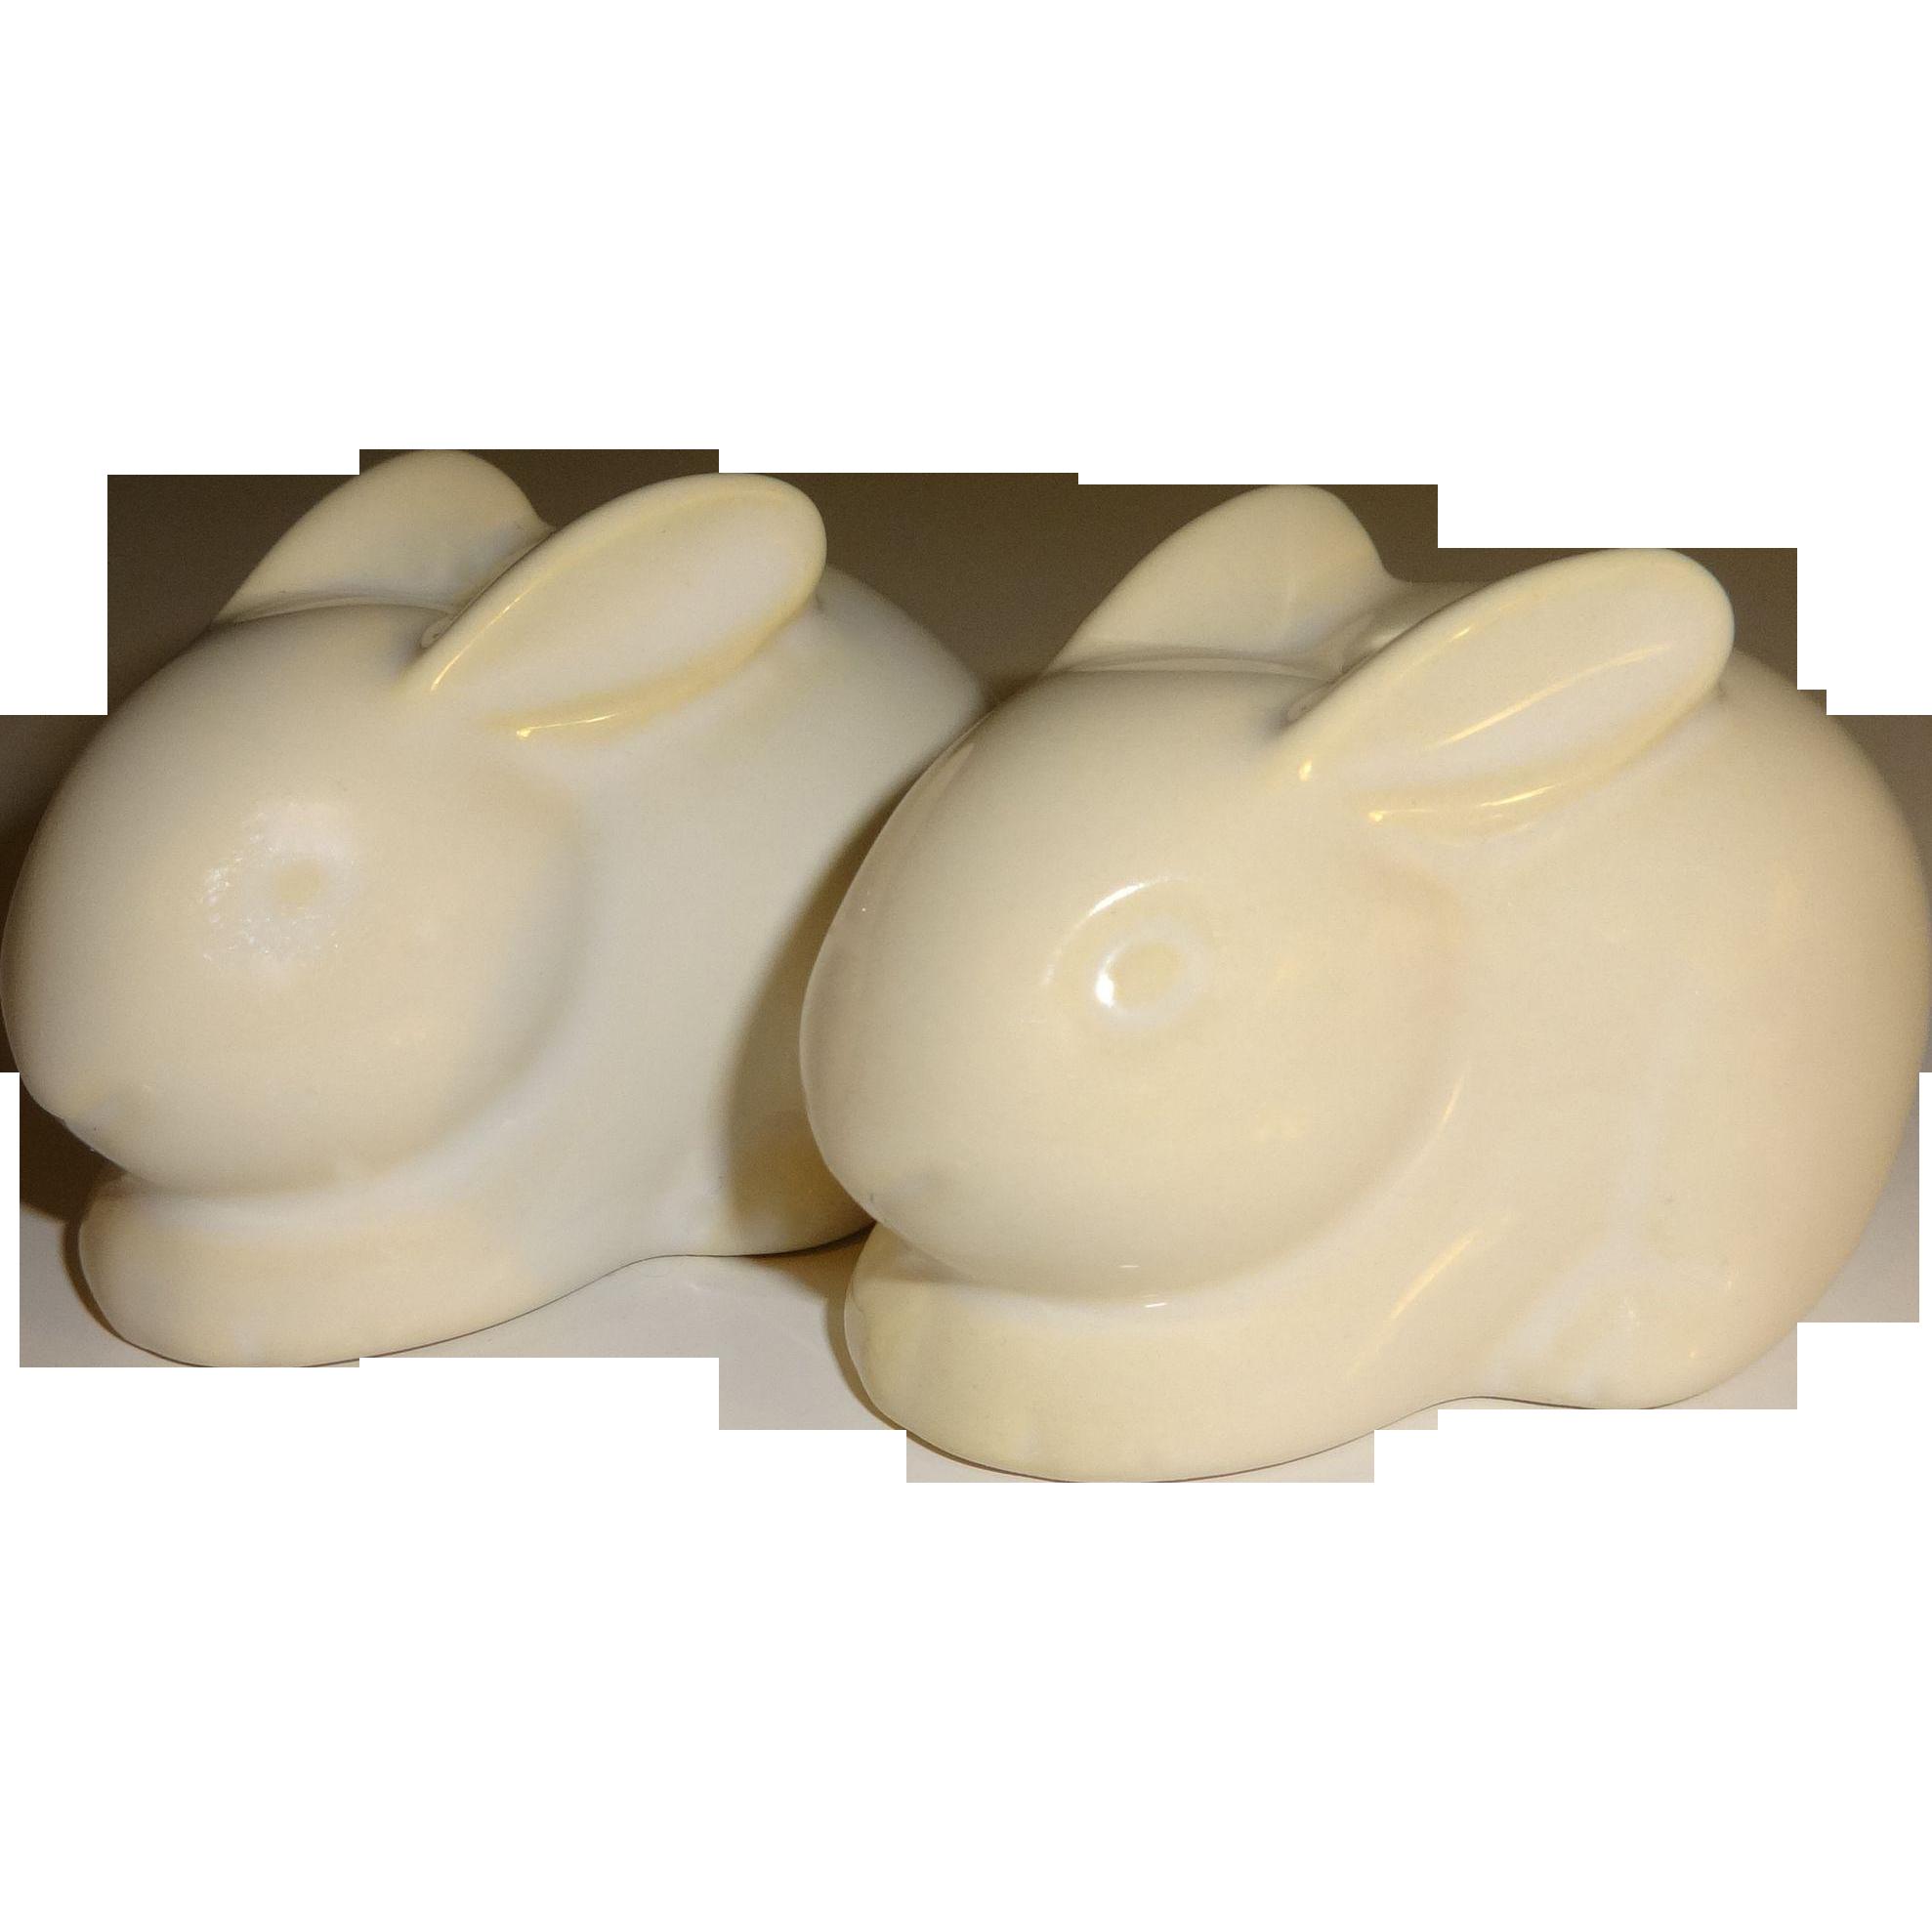 Hallmark White Bunnies Salt and Pepper Shakers